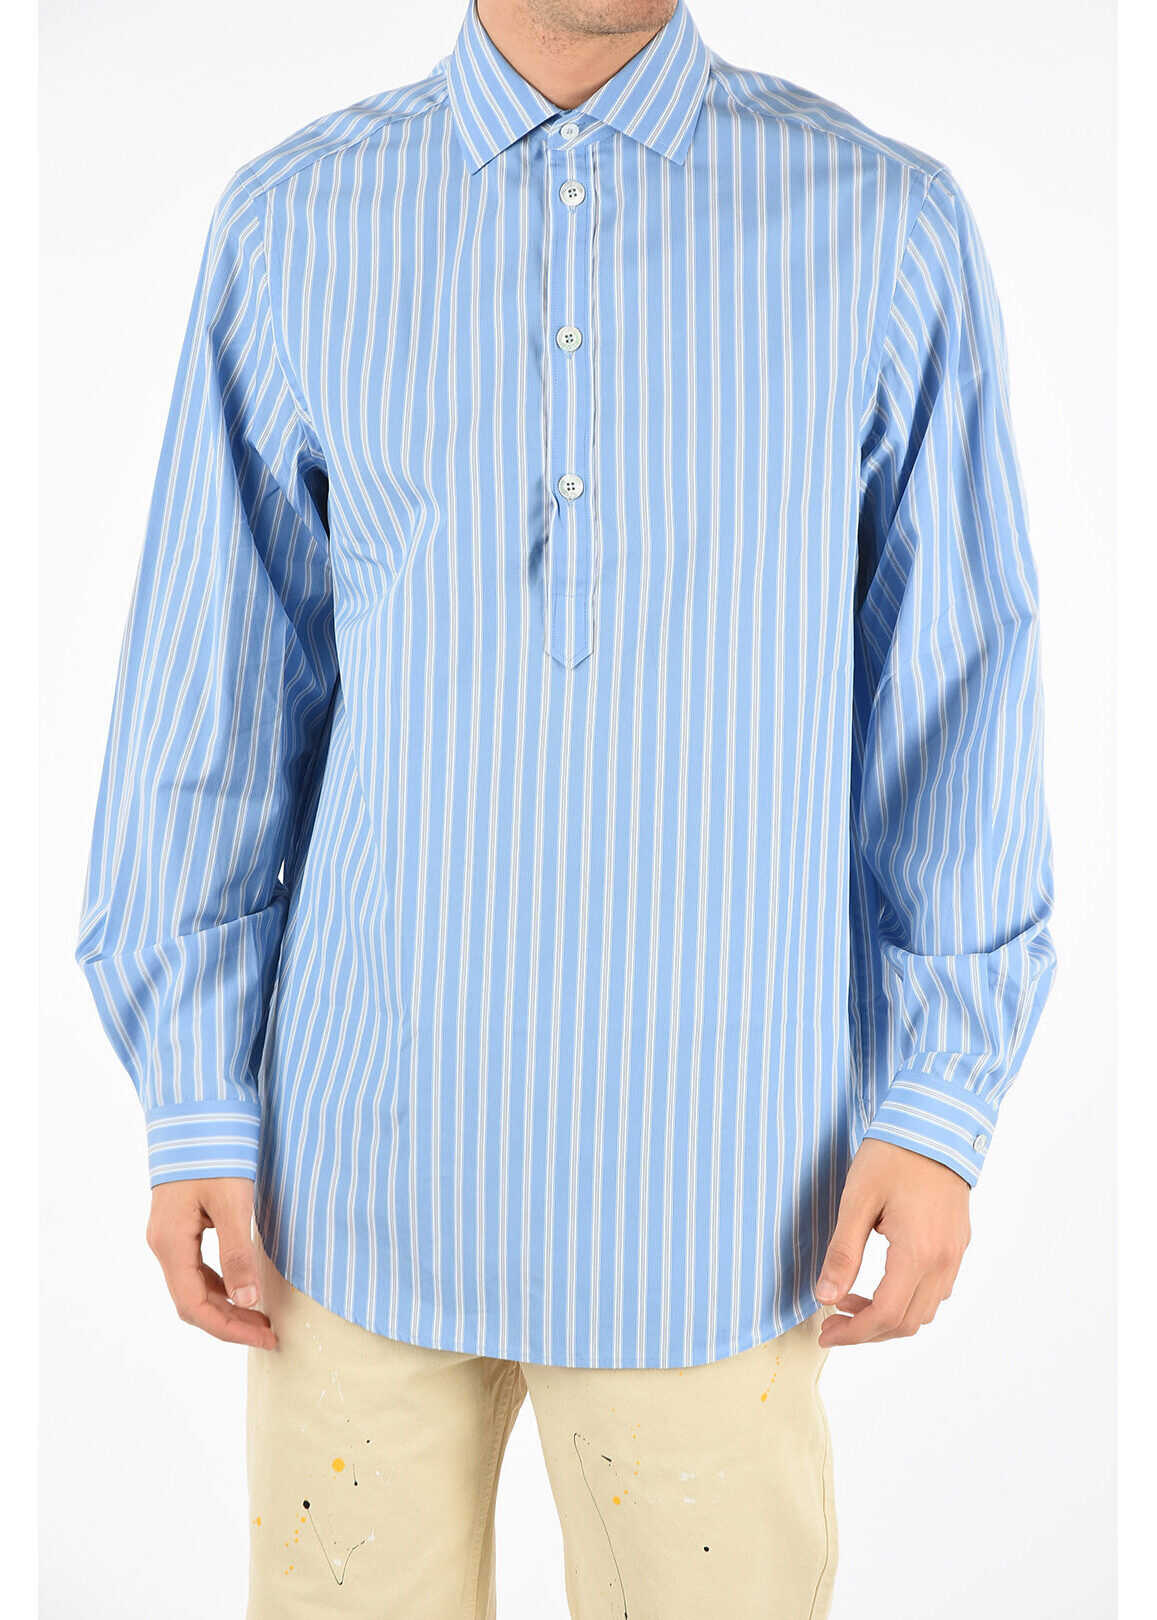 Gucci Striped Shirt WHITE